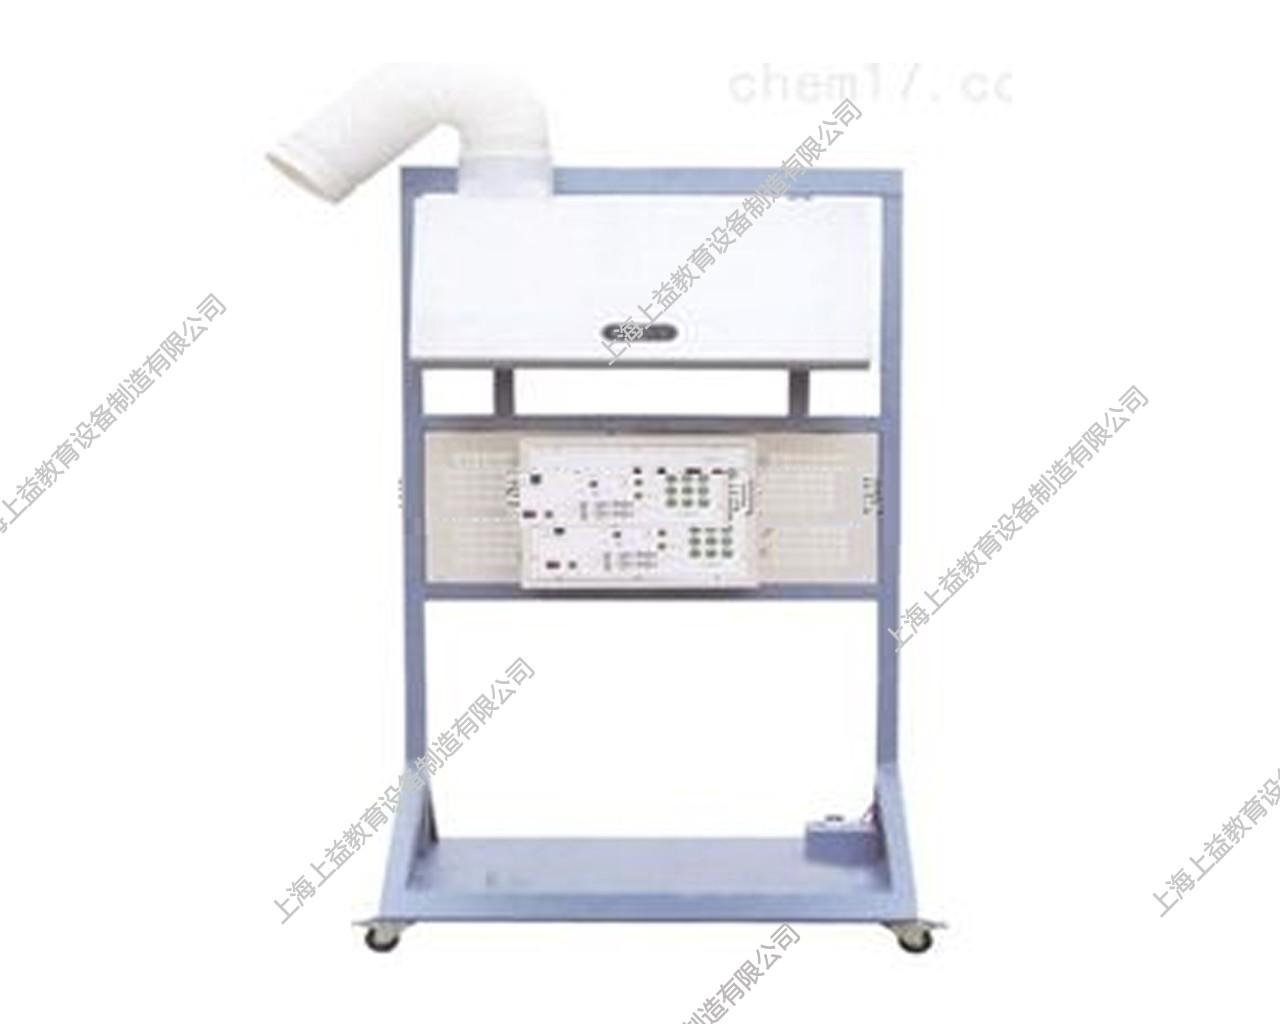 SYBP-02S型 变频式抽油烟机维修技能wwwlehu8viplehu68vip装置